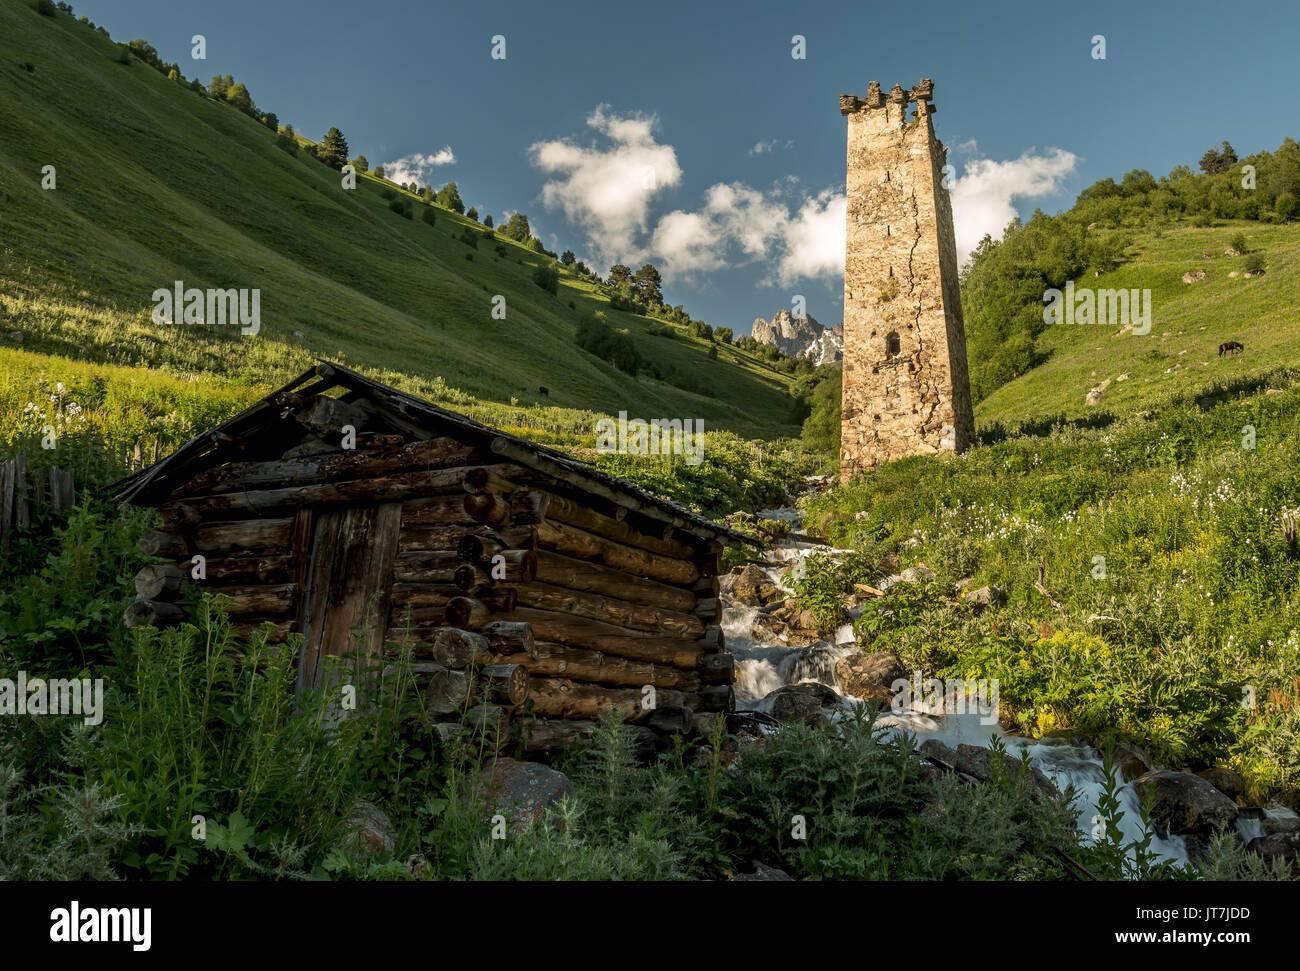 Scenery of Caucasus Svaneti landscape with old medieval defense stone tower, the mountain range, glacial stream, Adishi village, Georgia - Stock Image